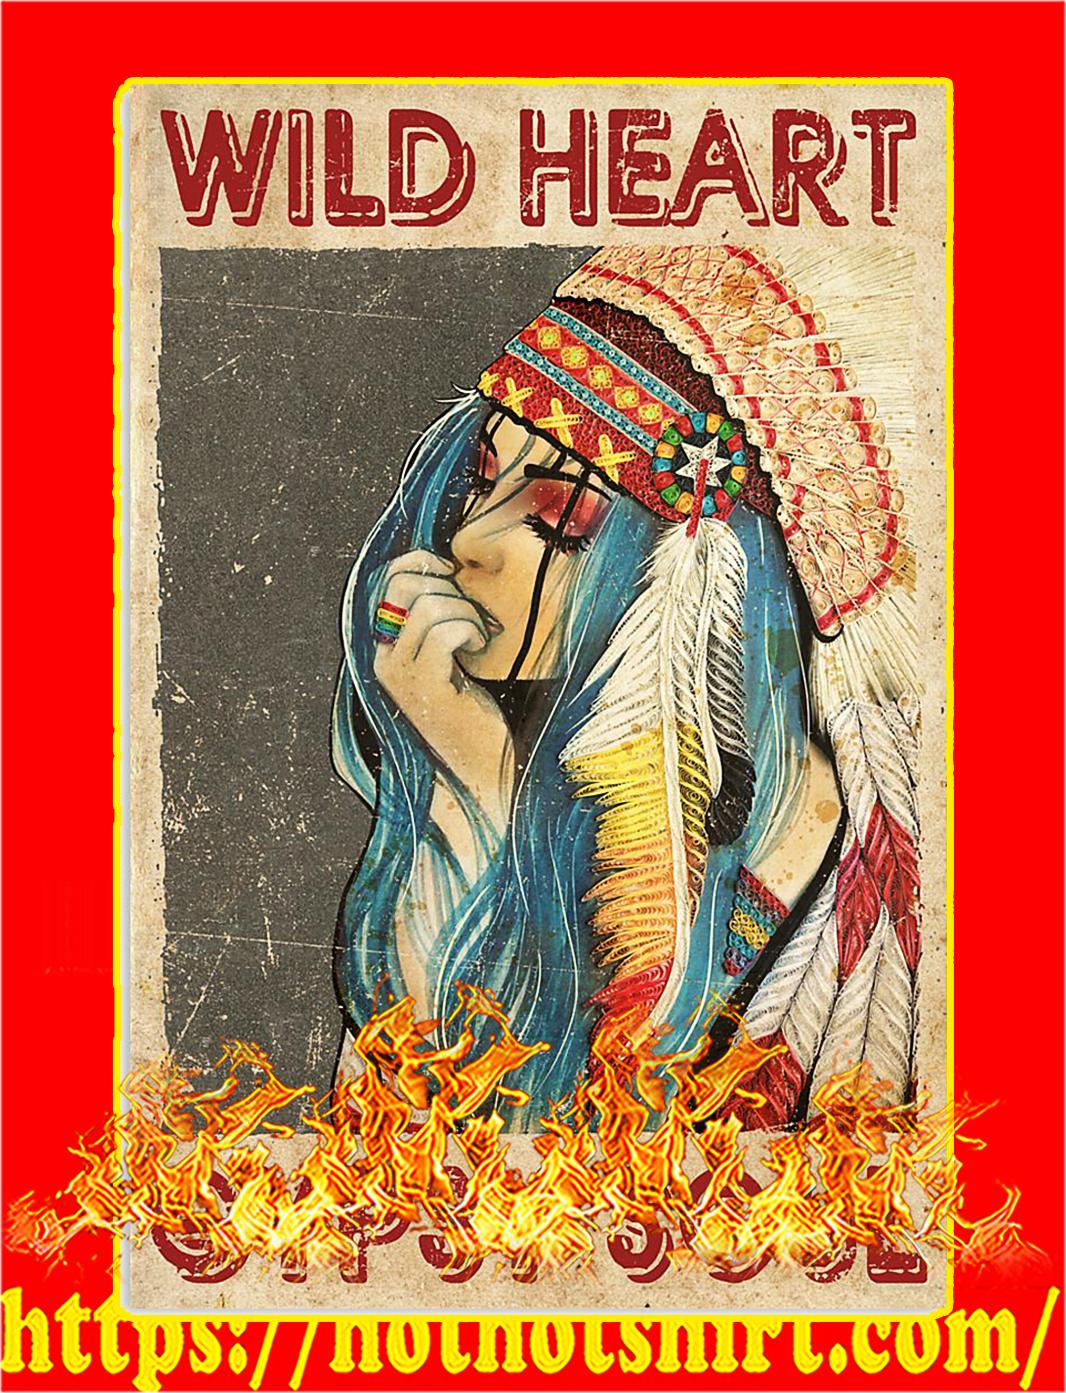 Wild heart gypsy soul poster - A4